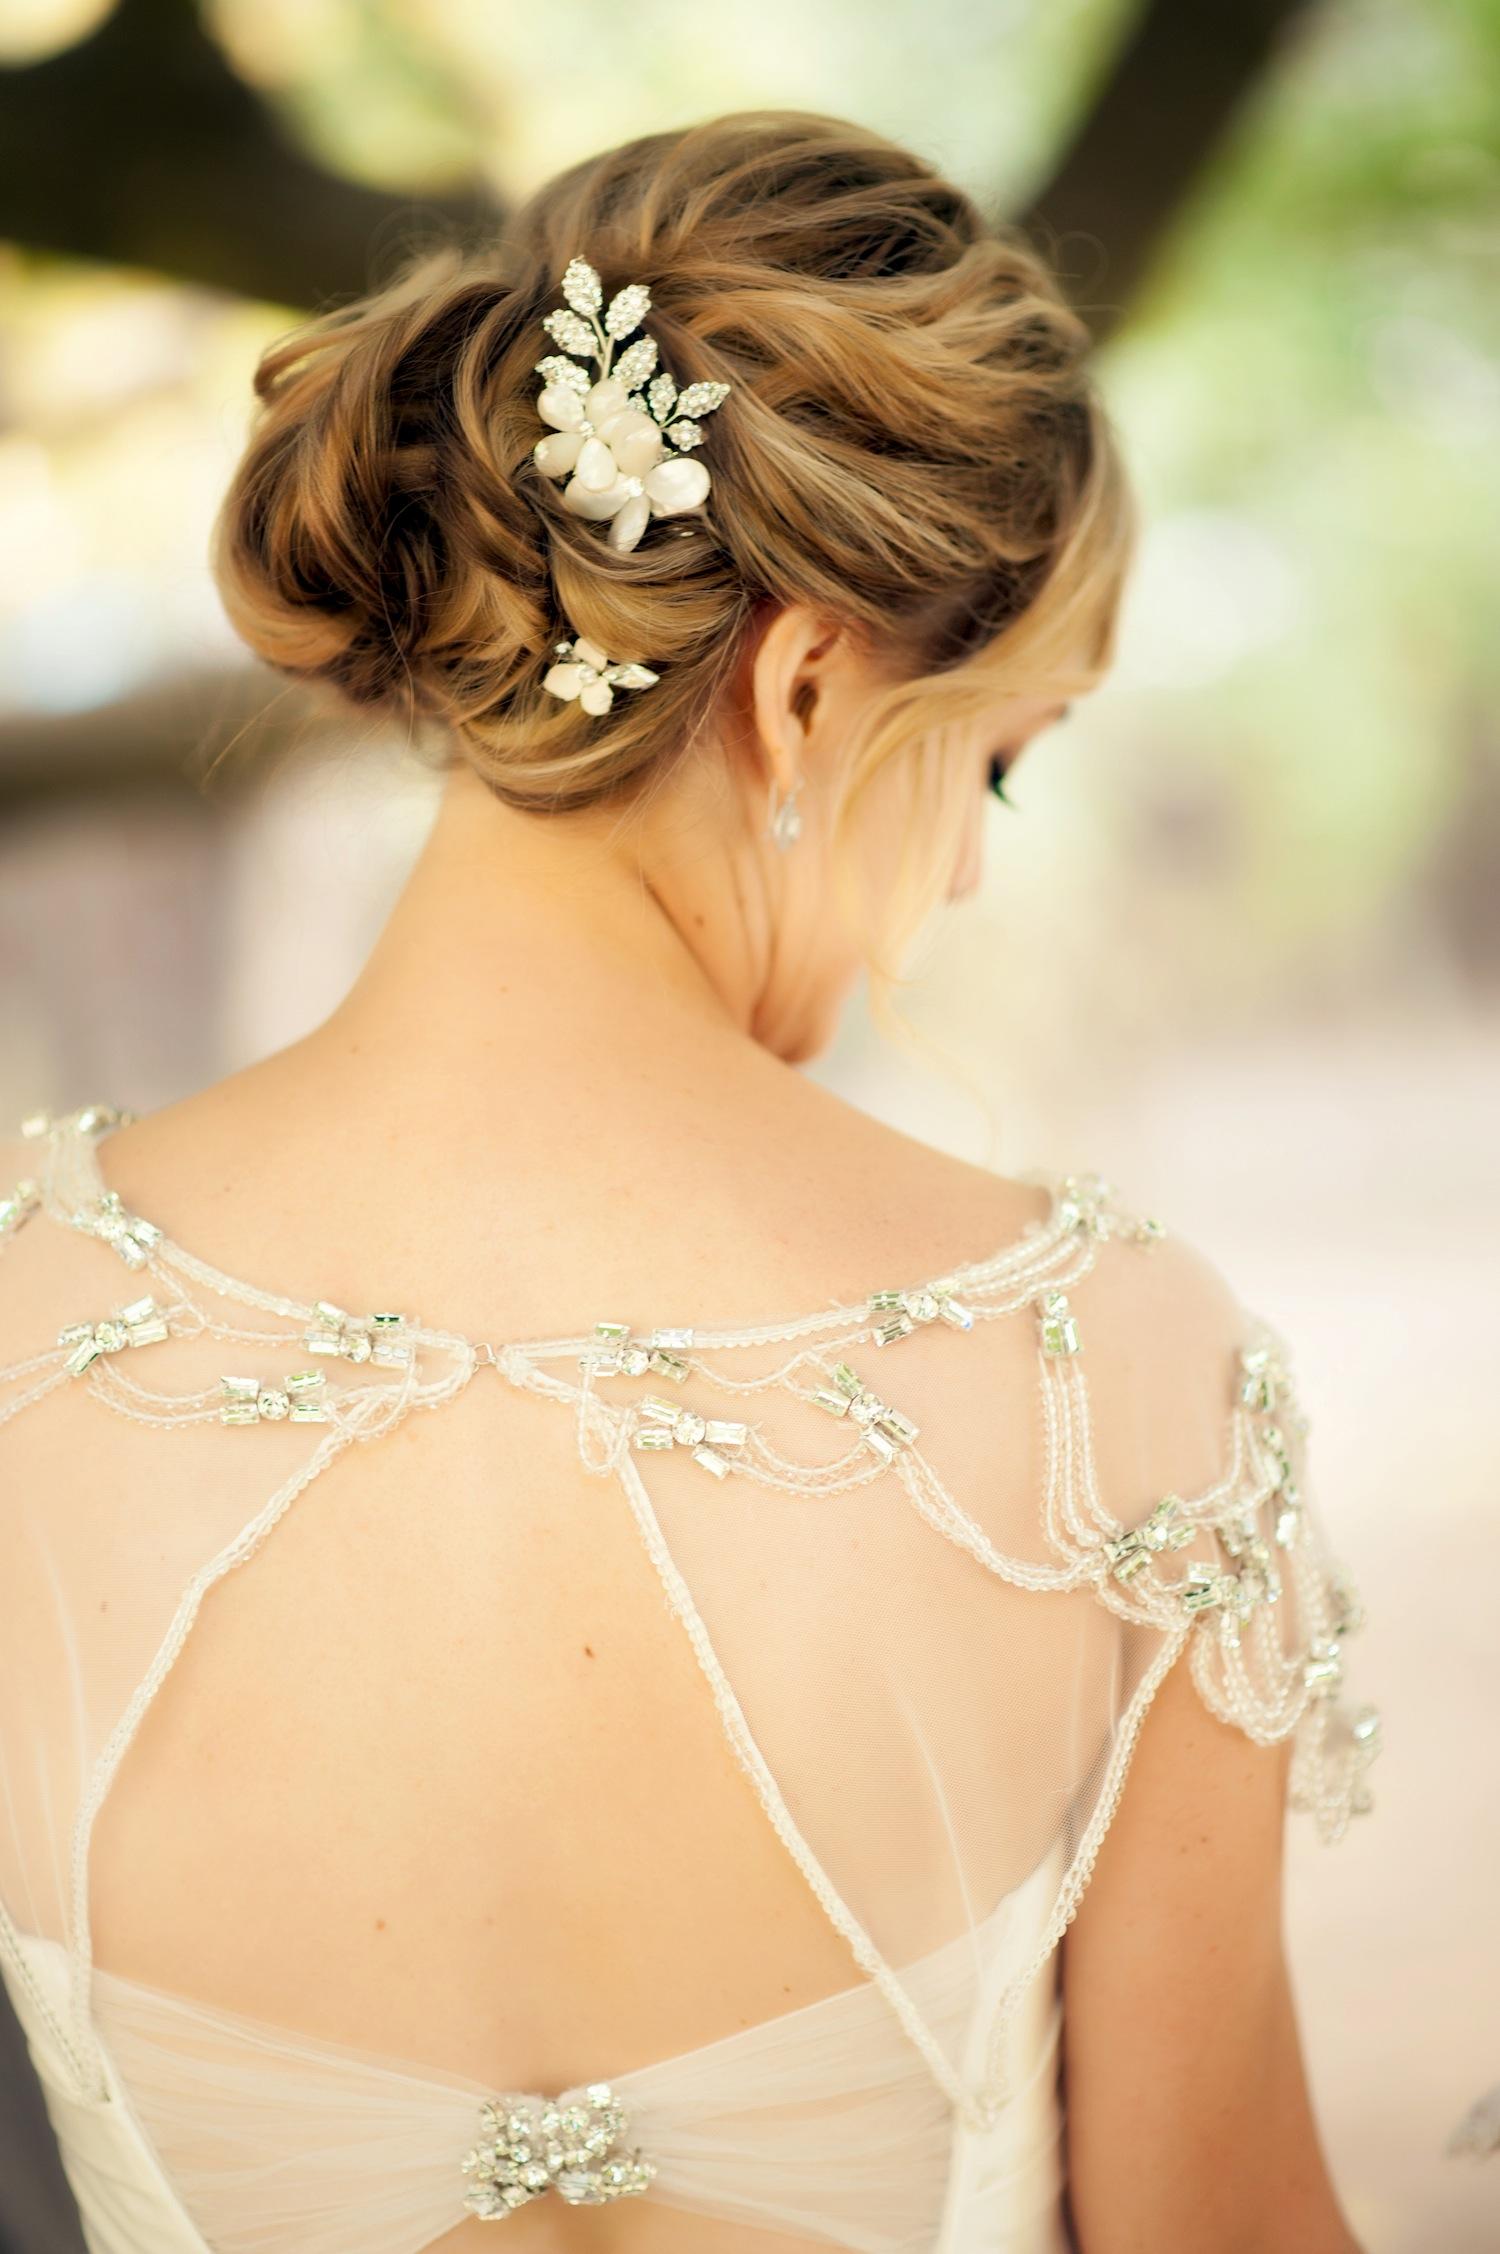 Pretty flower motif wedding day headpiece